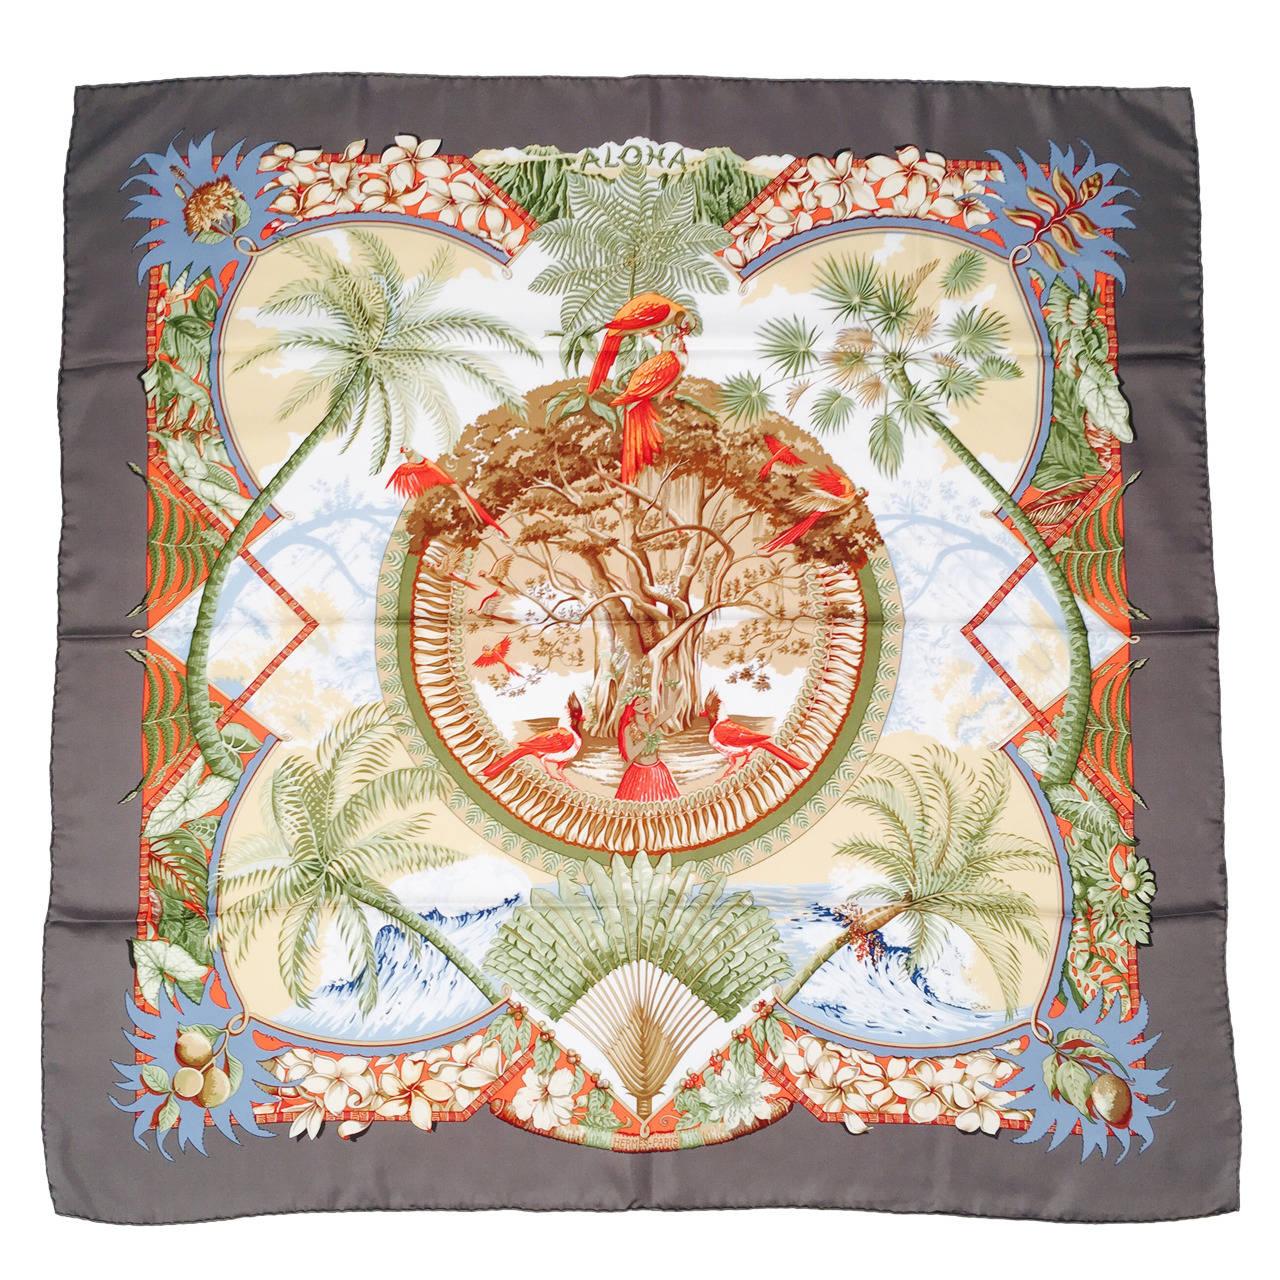 Hermès by Laurence Bourthoumieux Silk Twill Scarf